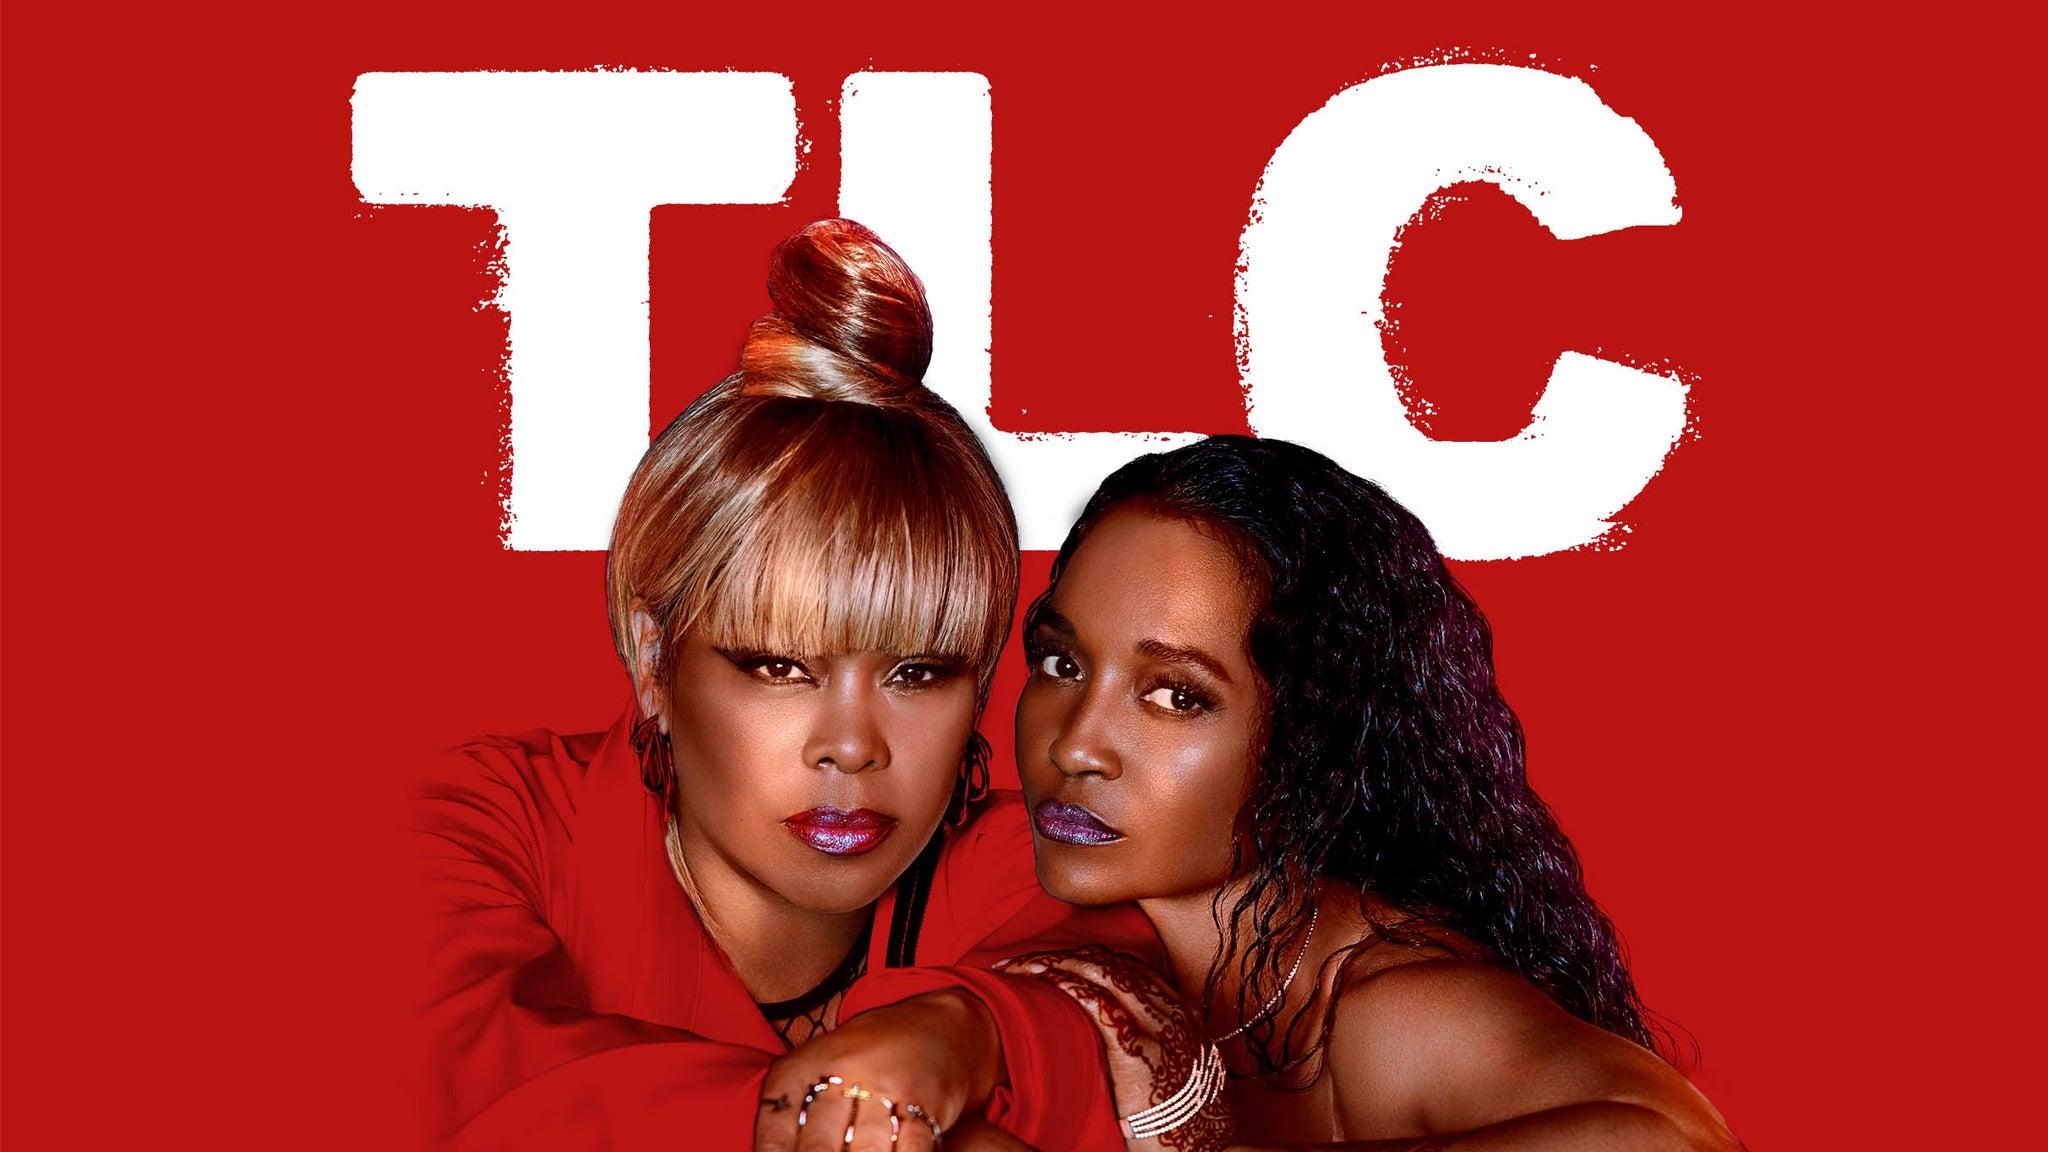 presale code for TLC tickets in Tampa - FL (Seminole Hard Rock Tampa Event Center)